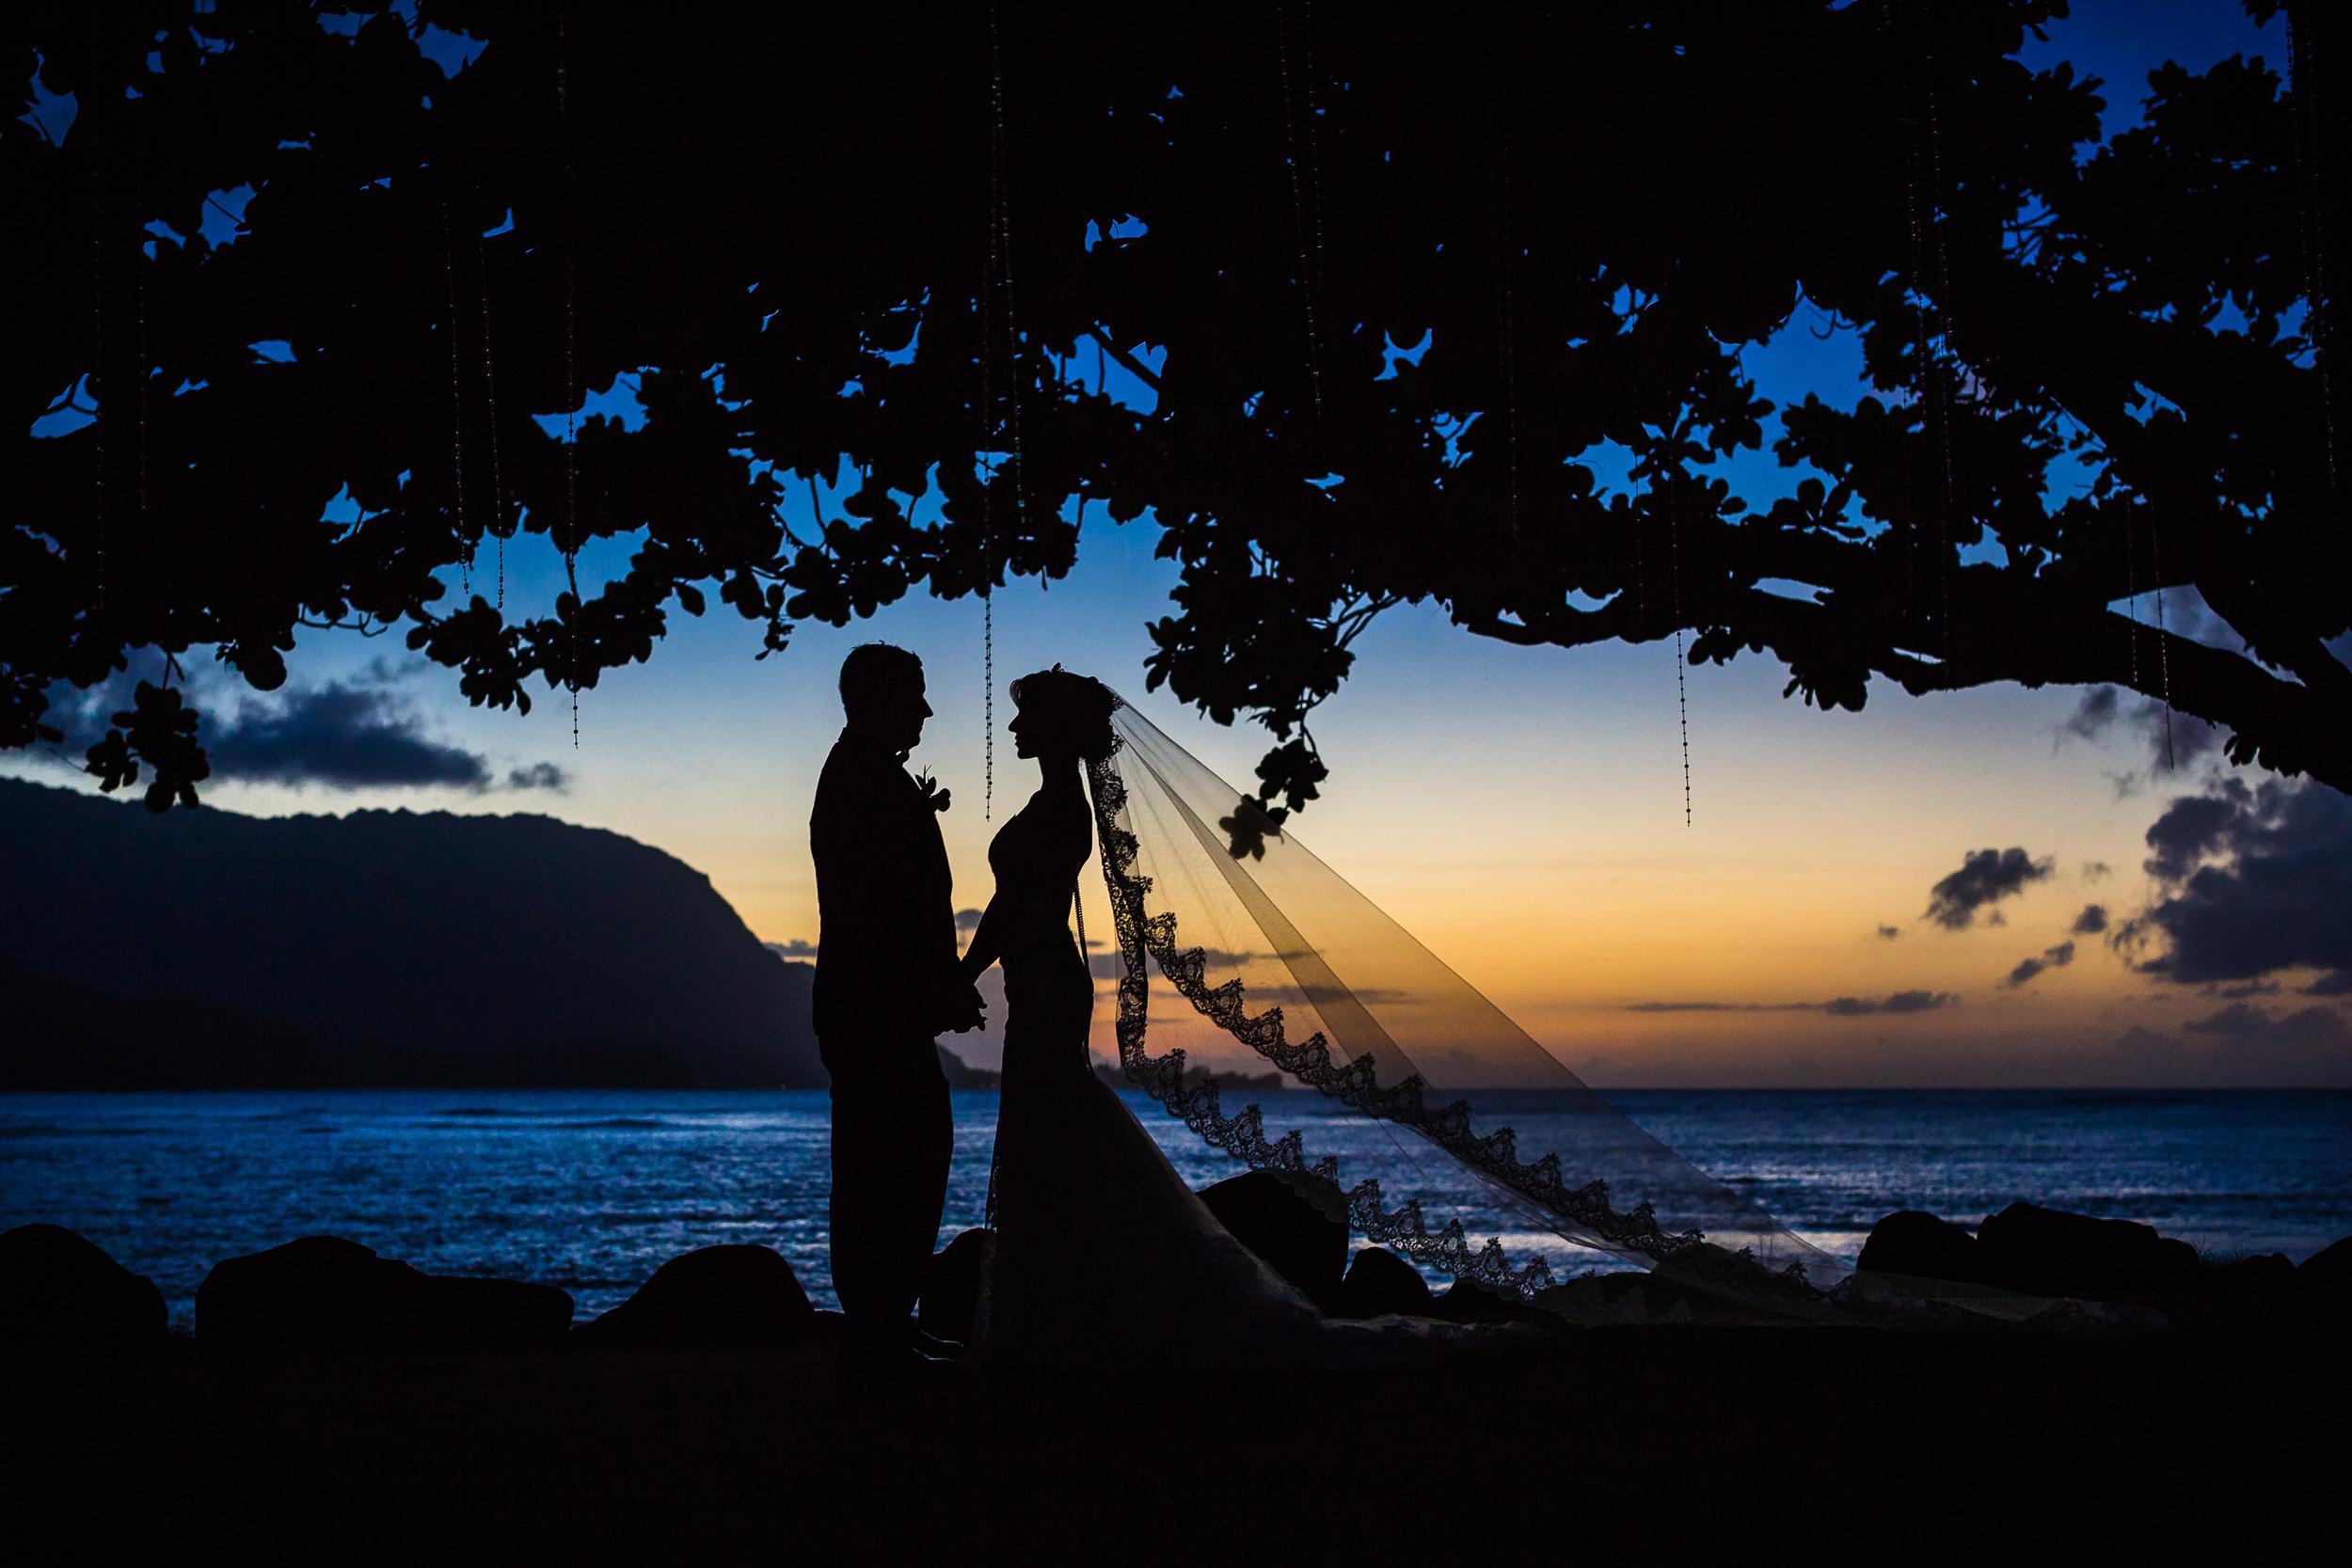 kauai destination wedding photographer shipwrecks beach poipu hanalei maui Brian Finch princeville loveblissimaging.com na aina kai.jpg.jpg